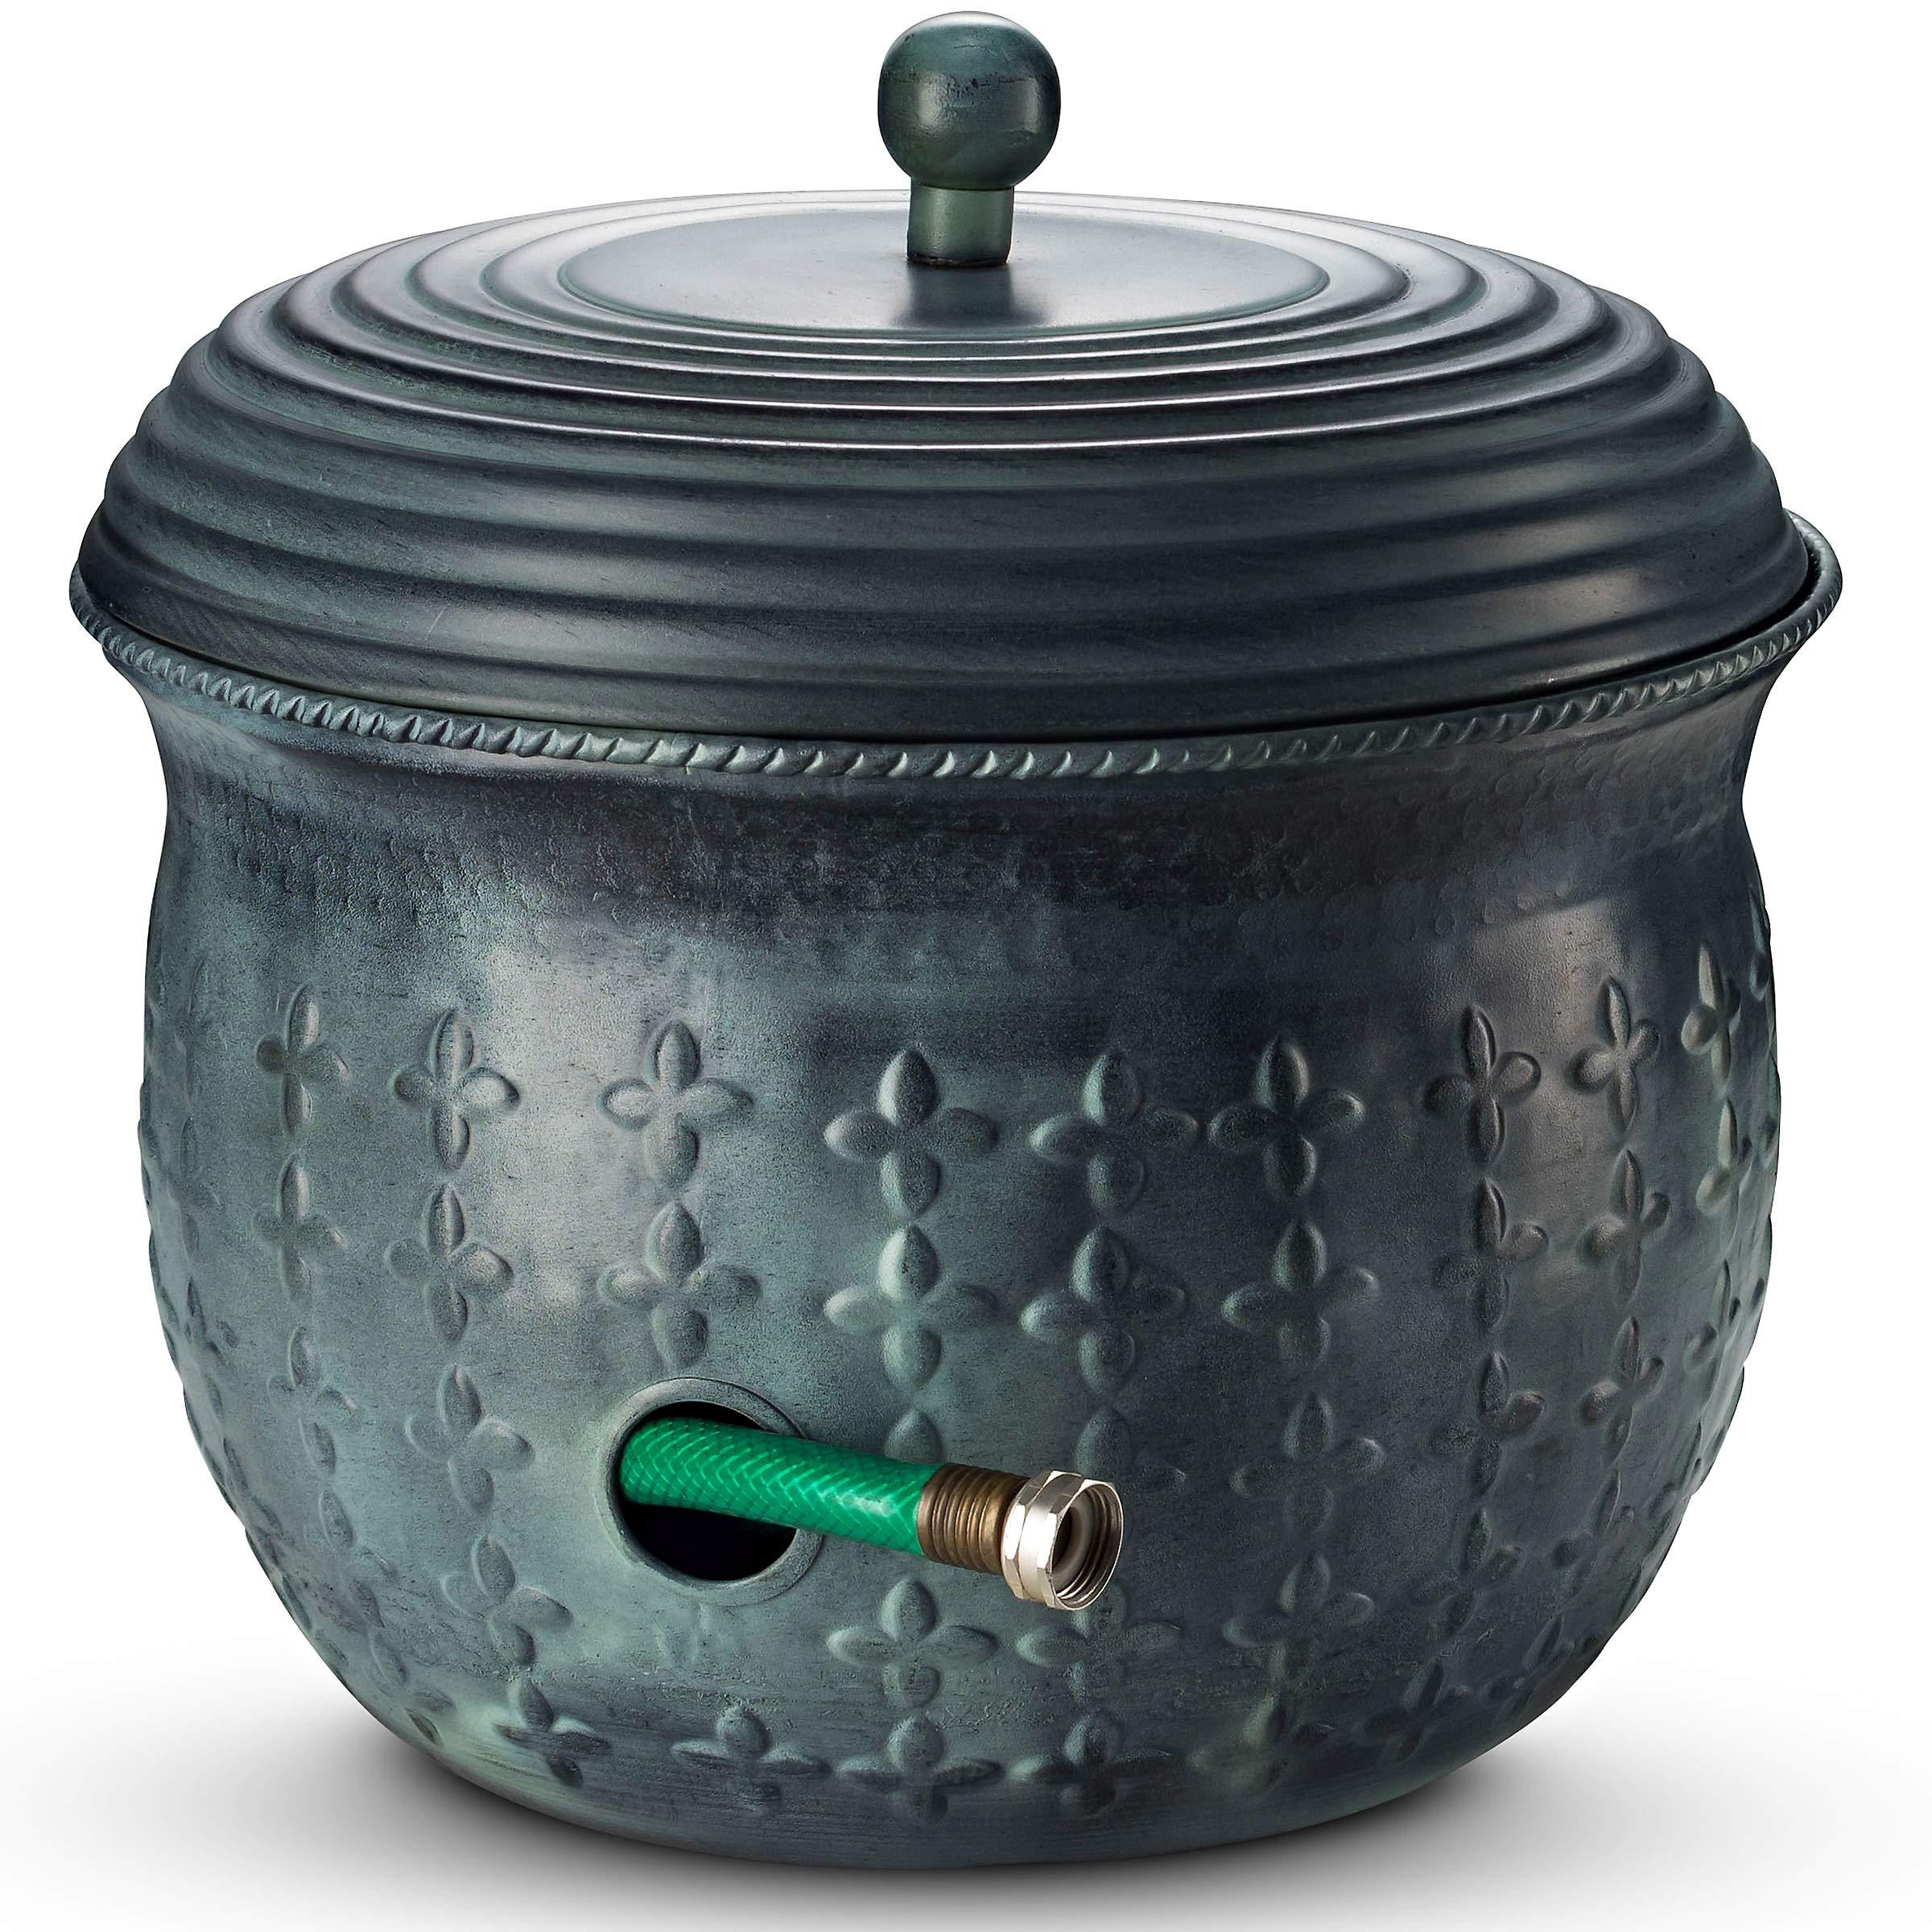 Garden Hose Holder Storage Pot Copper with Lid Antique Green Finish Lattice Steel by LifeSmart